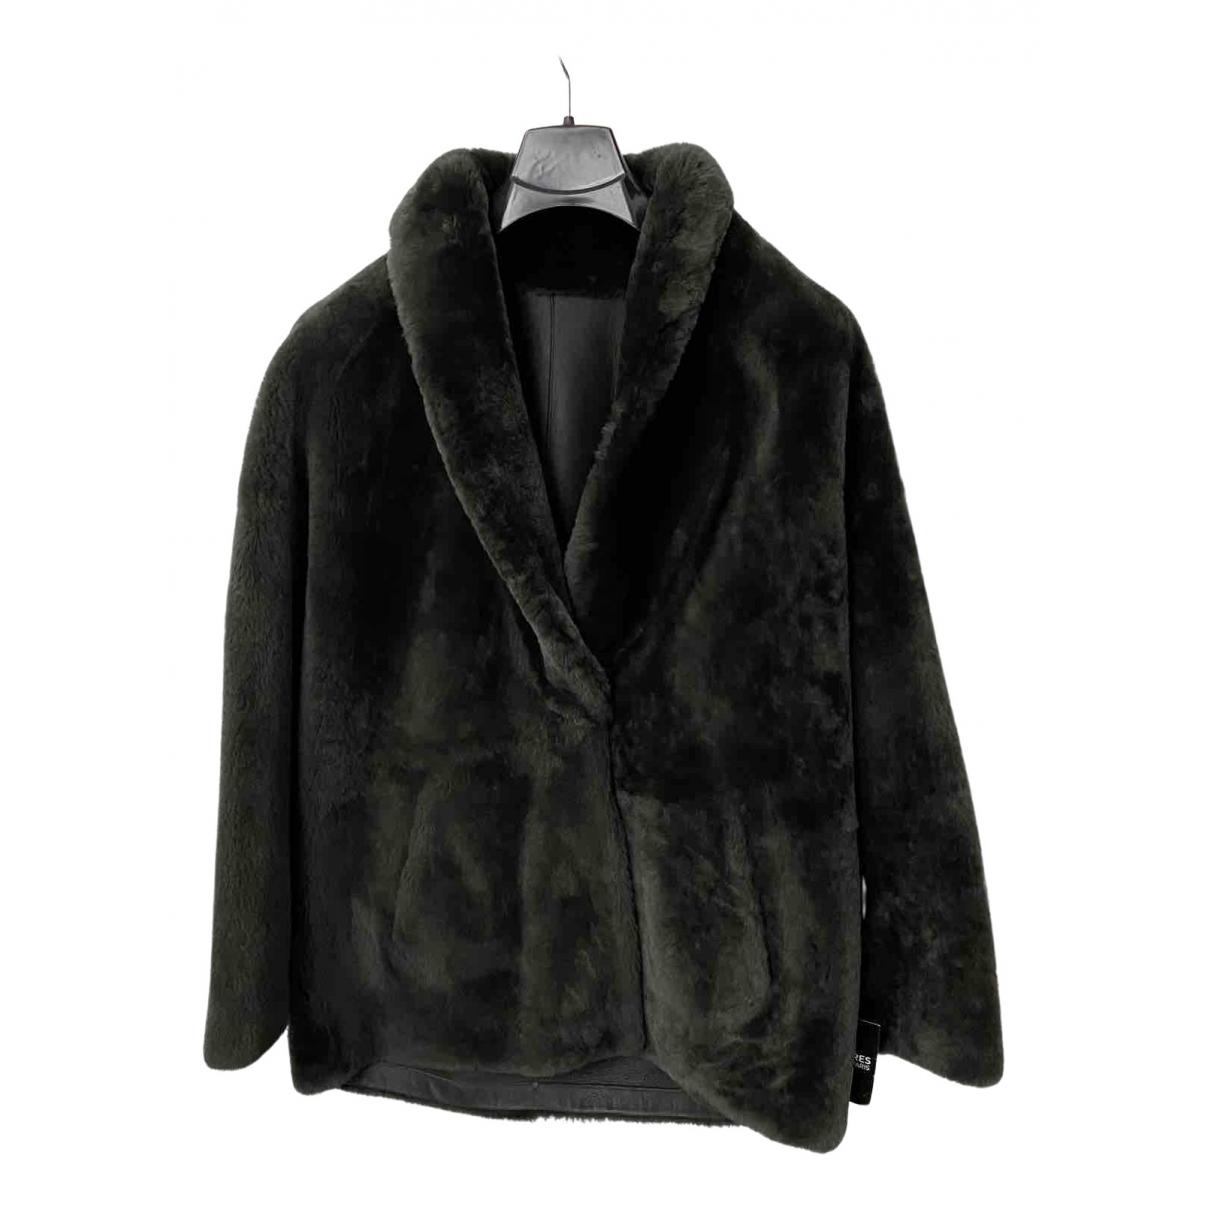 Sprung Frères \N Green Shearling coat for Women S International